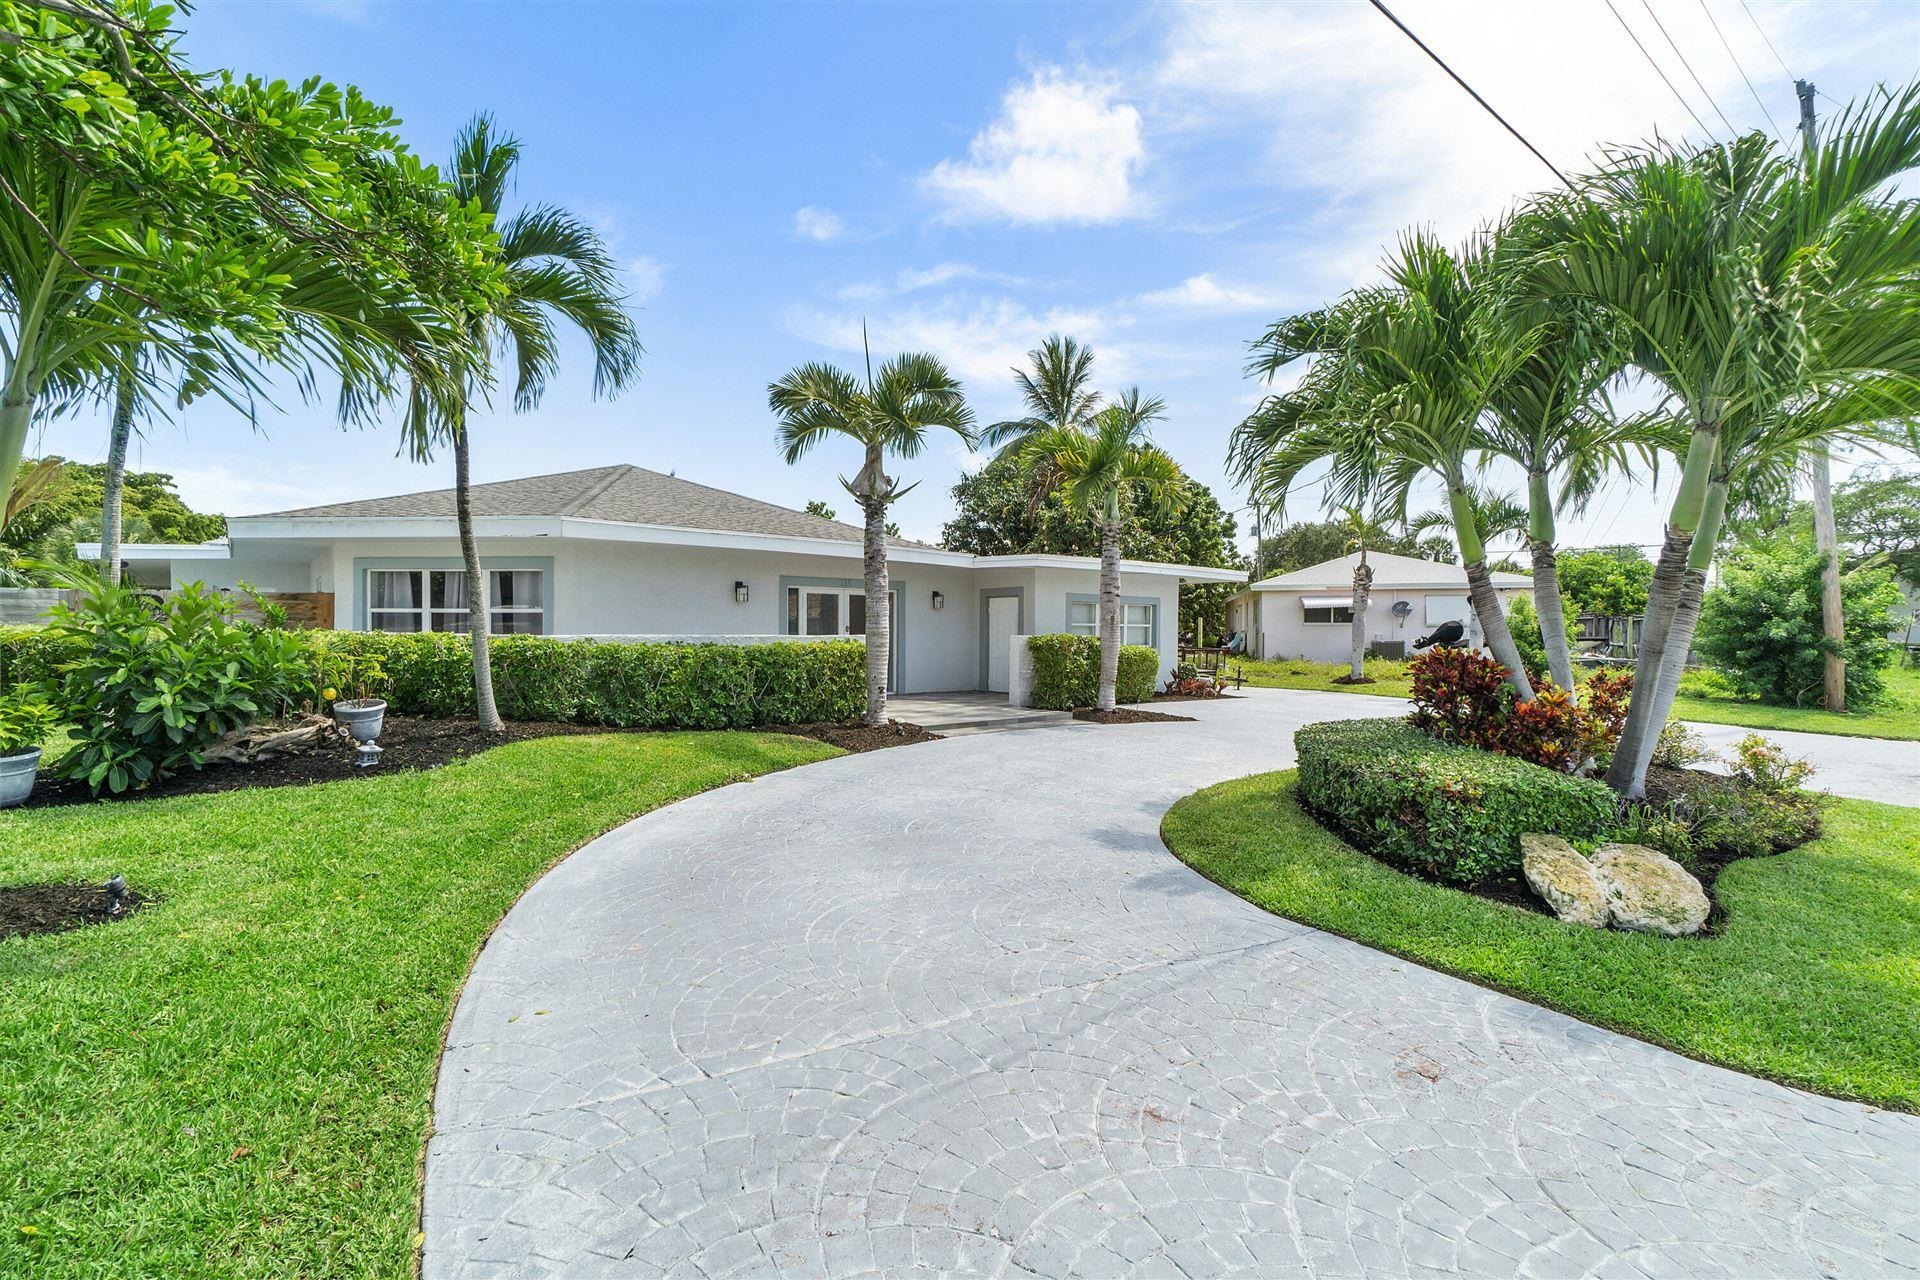 Photo of 255 SW 14th Place, Boca Raton, FL 33432 (MLS # RX-10753538)